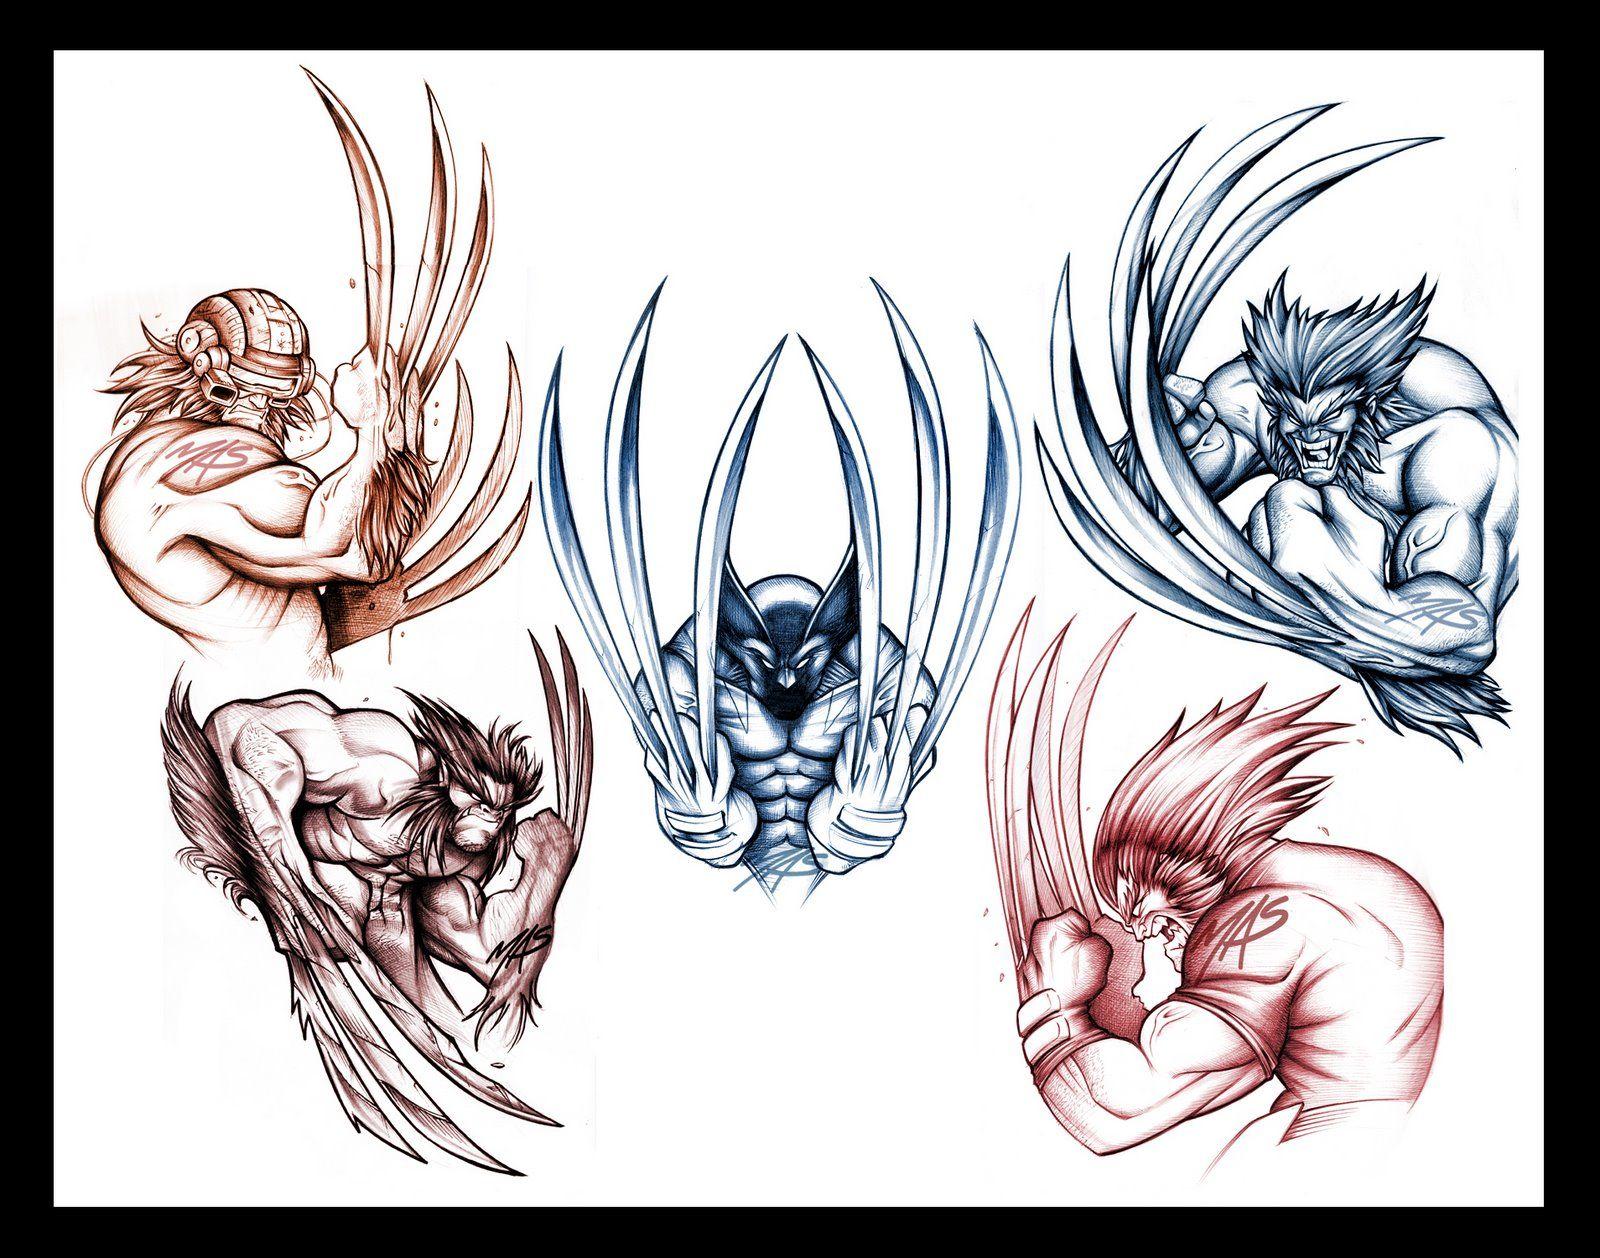 wolverine tattoo sketch concepts i whipped up mas sketchwork pinterest wolverine tattoo. Black Bedroom Furniture Sets. Home Design Ideas